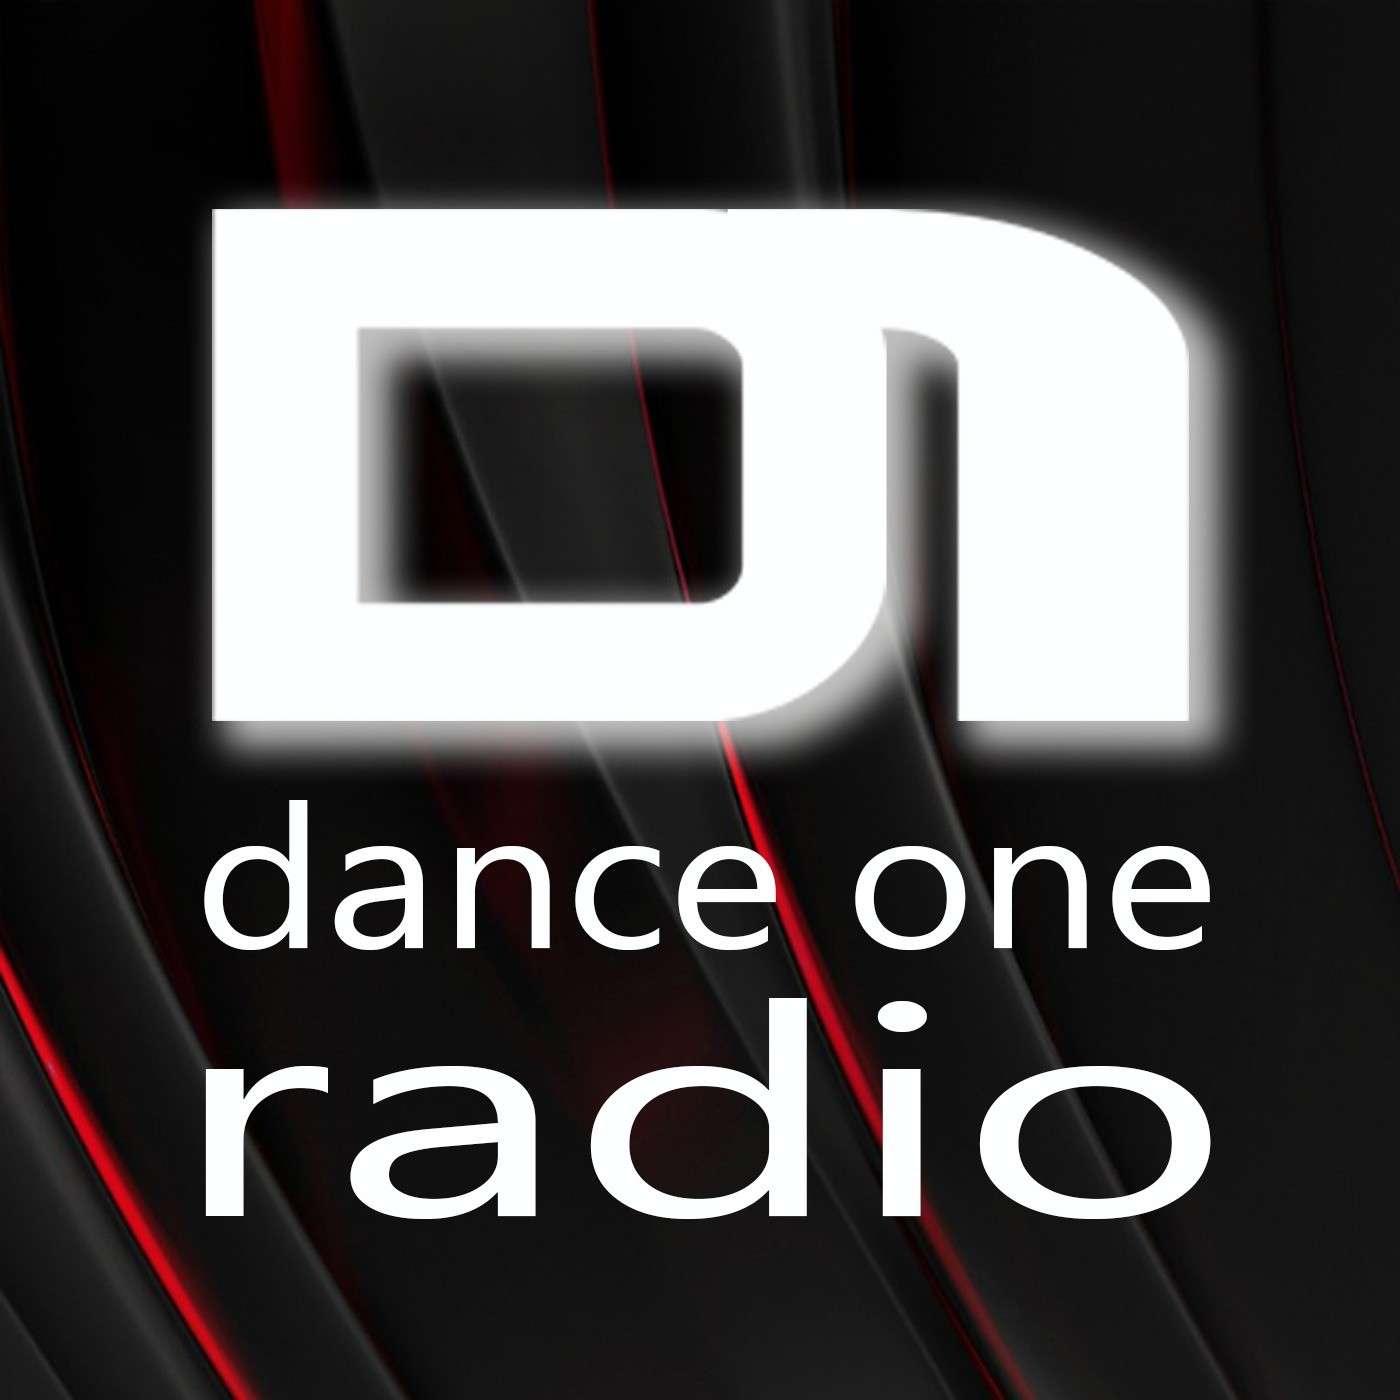 Dance One Radio   world's best dance music radio station